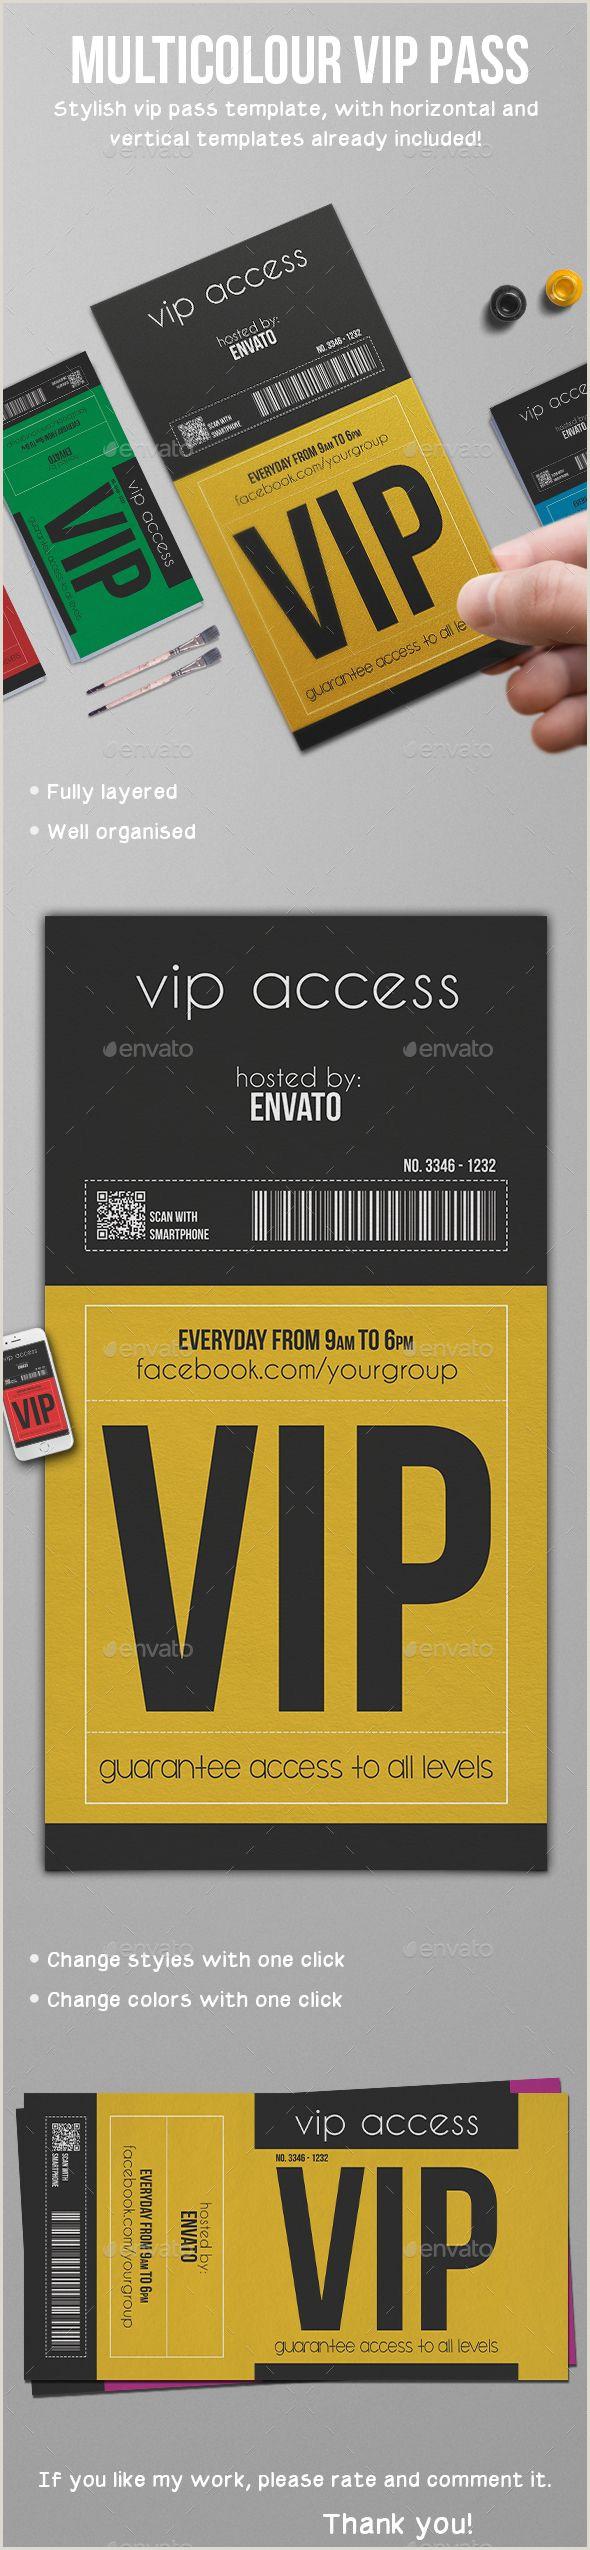 Vip ticket invitation template hpcr